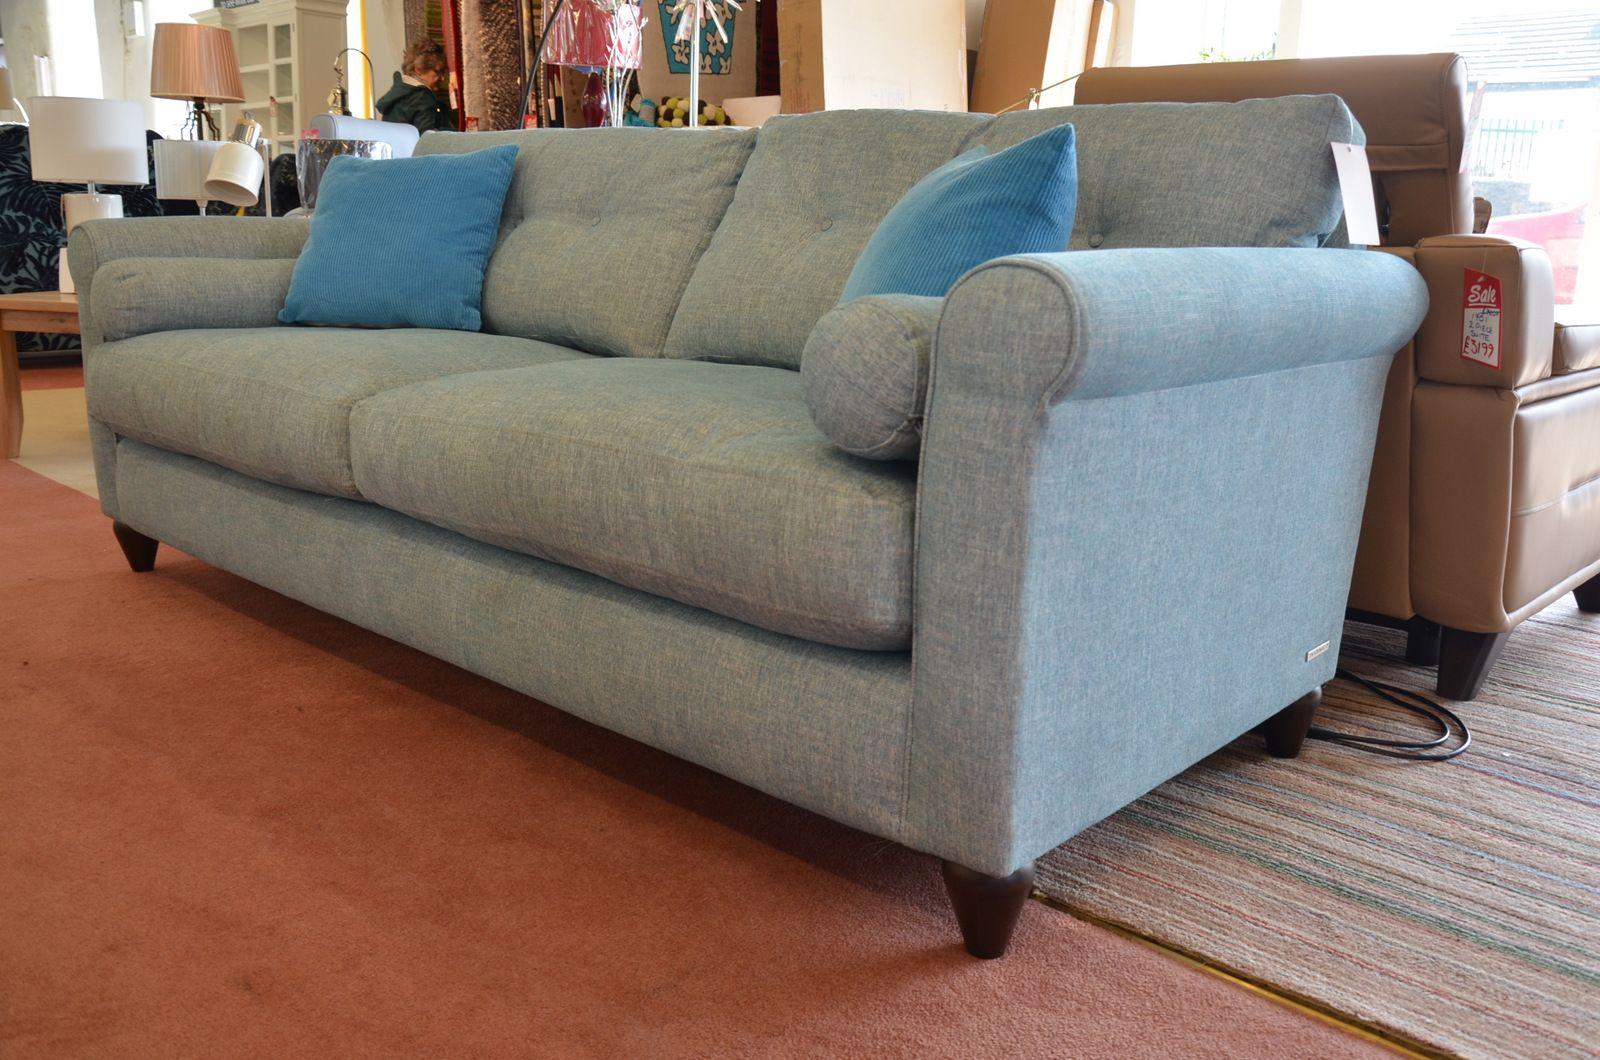 W B Clearance Furniture